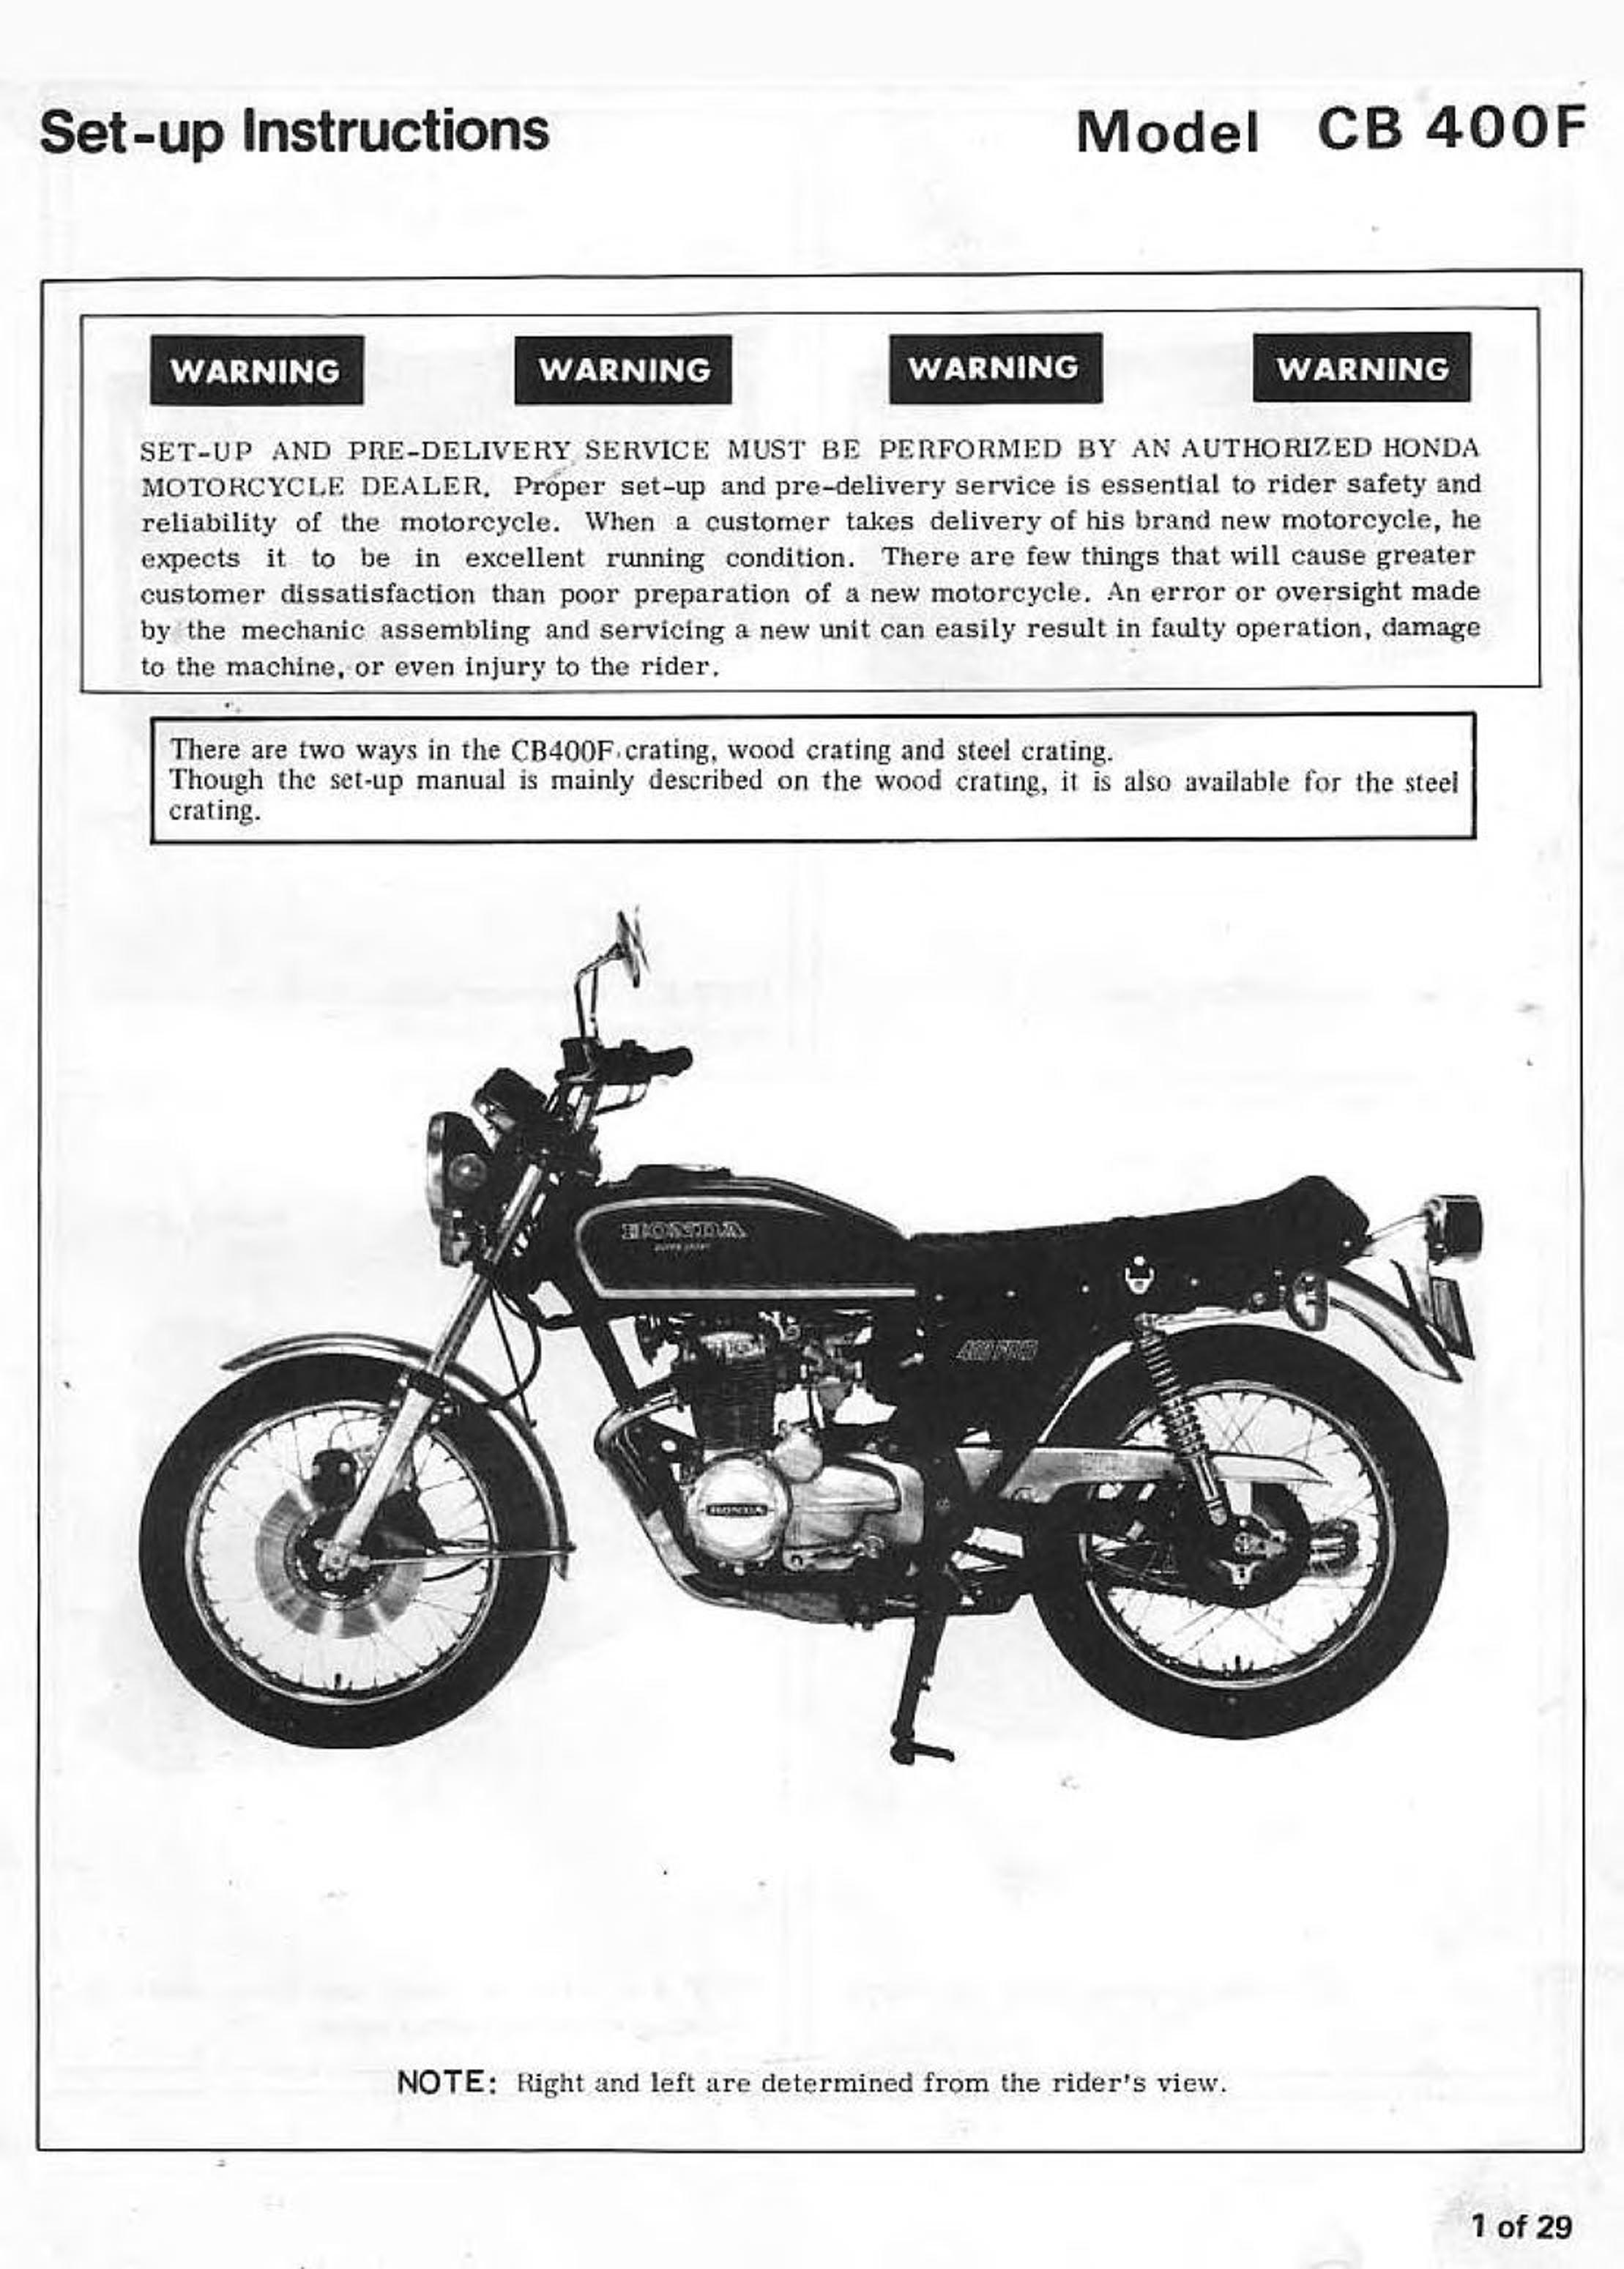 Setup Manual for Honda CB400F